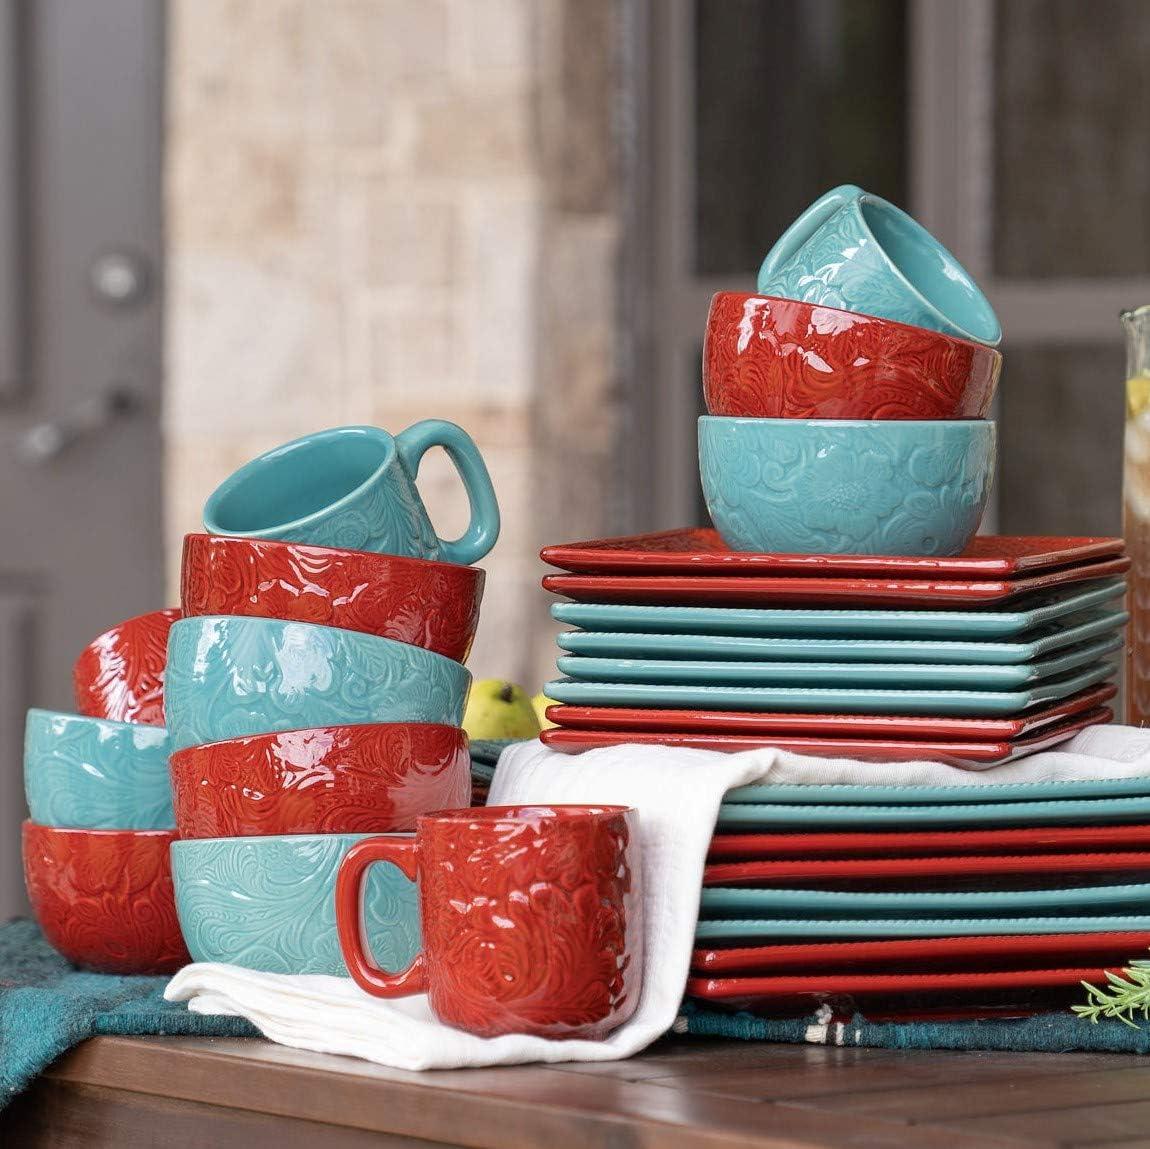 "HiEnd Accents Savannah 16-Piece Western Dinnerware Set, Dinner Plate-10.75"", Salad Plate-8.75"", Mug-16 oz, Soup Bowl-5.75"", Turquoise"